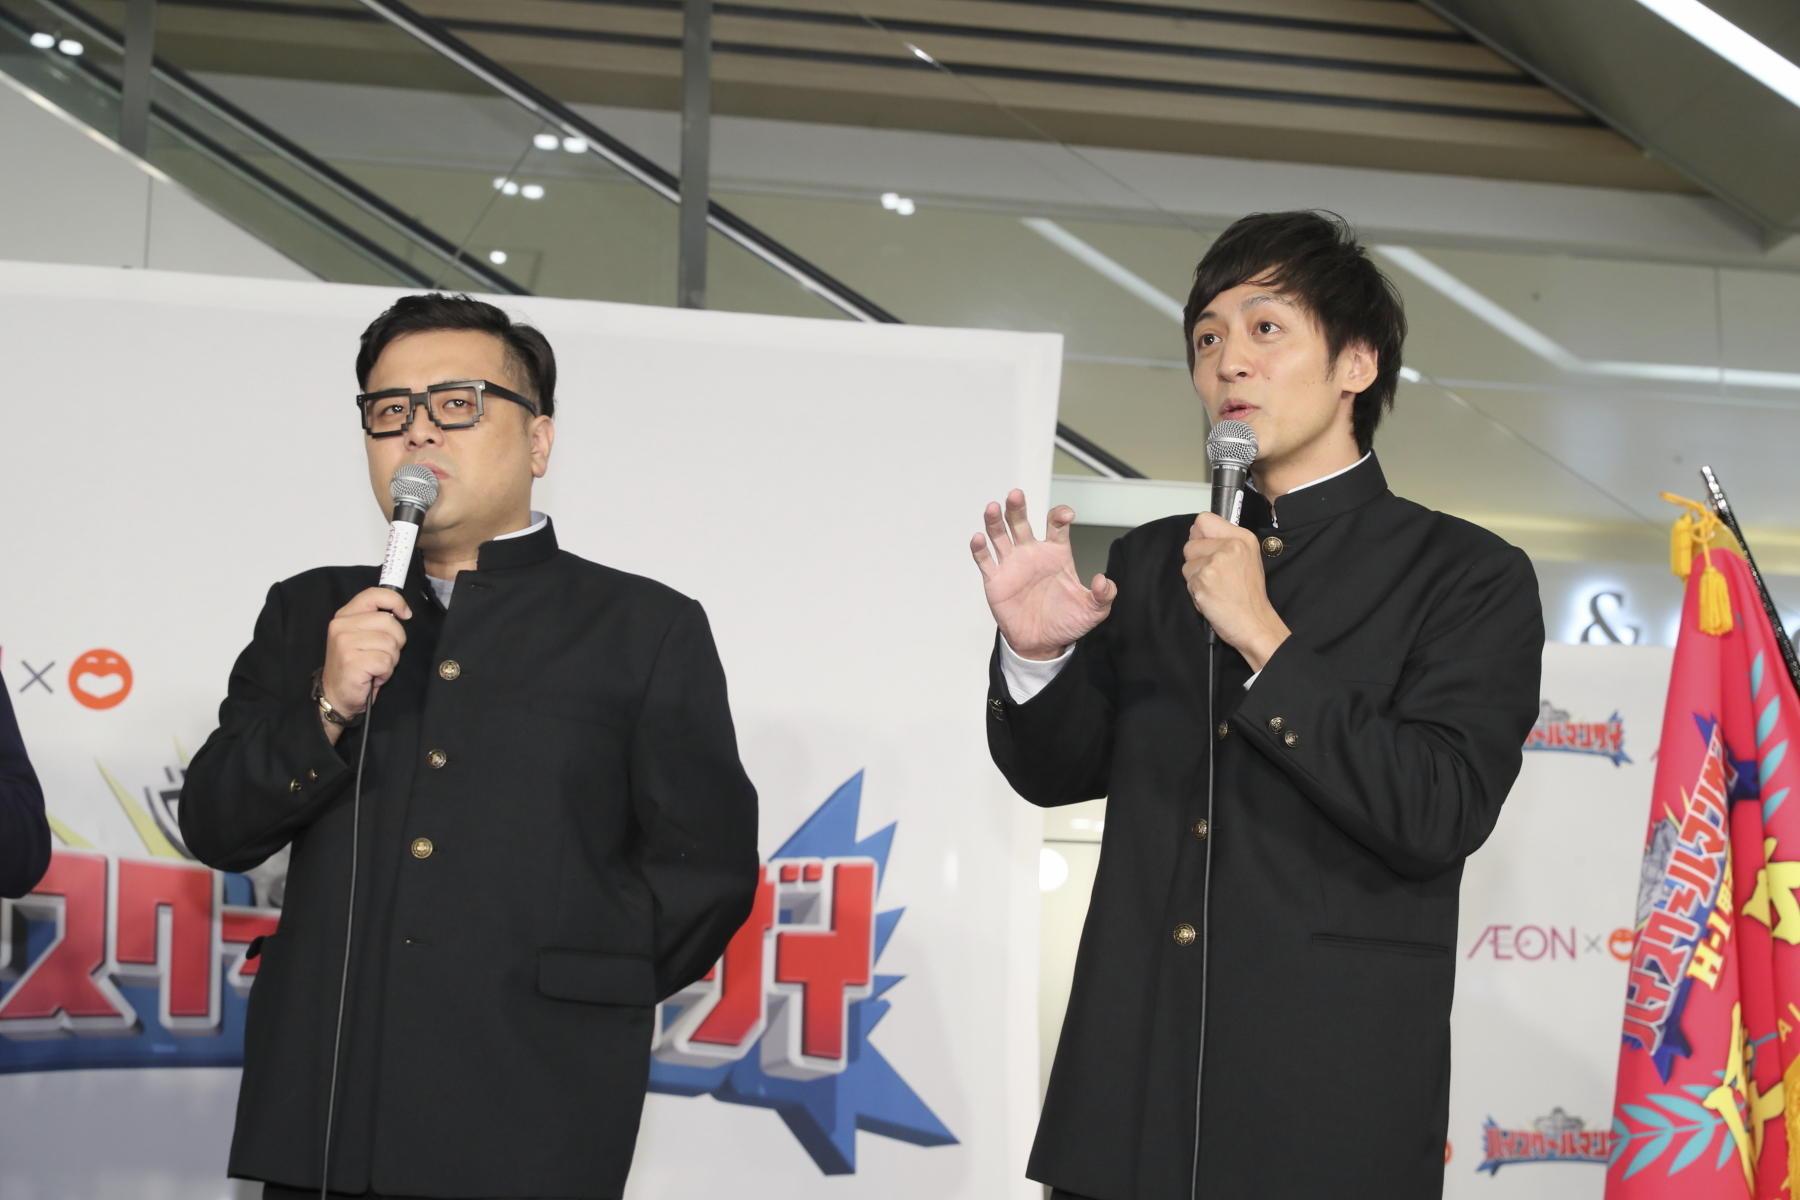 http://news.yoshimoto.co.jp/20180510215621-541555e4fff0d45b8bd14e9eded55f2644c4e579.jpg